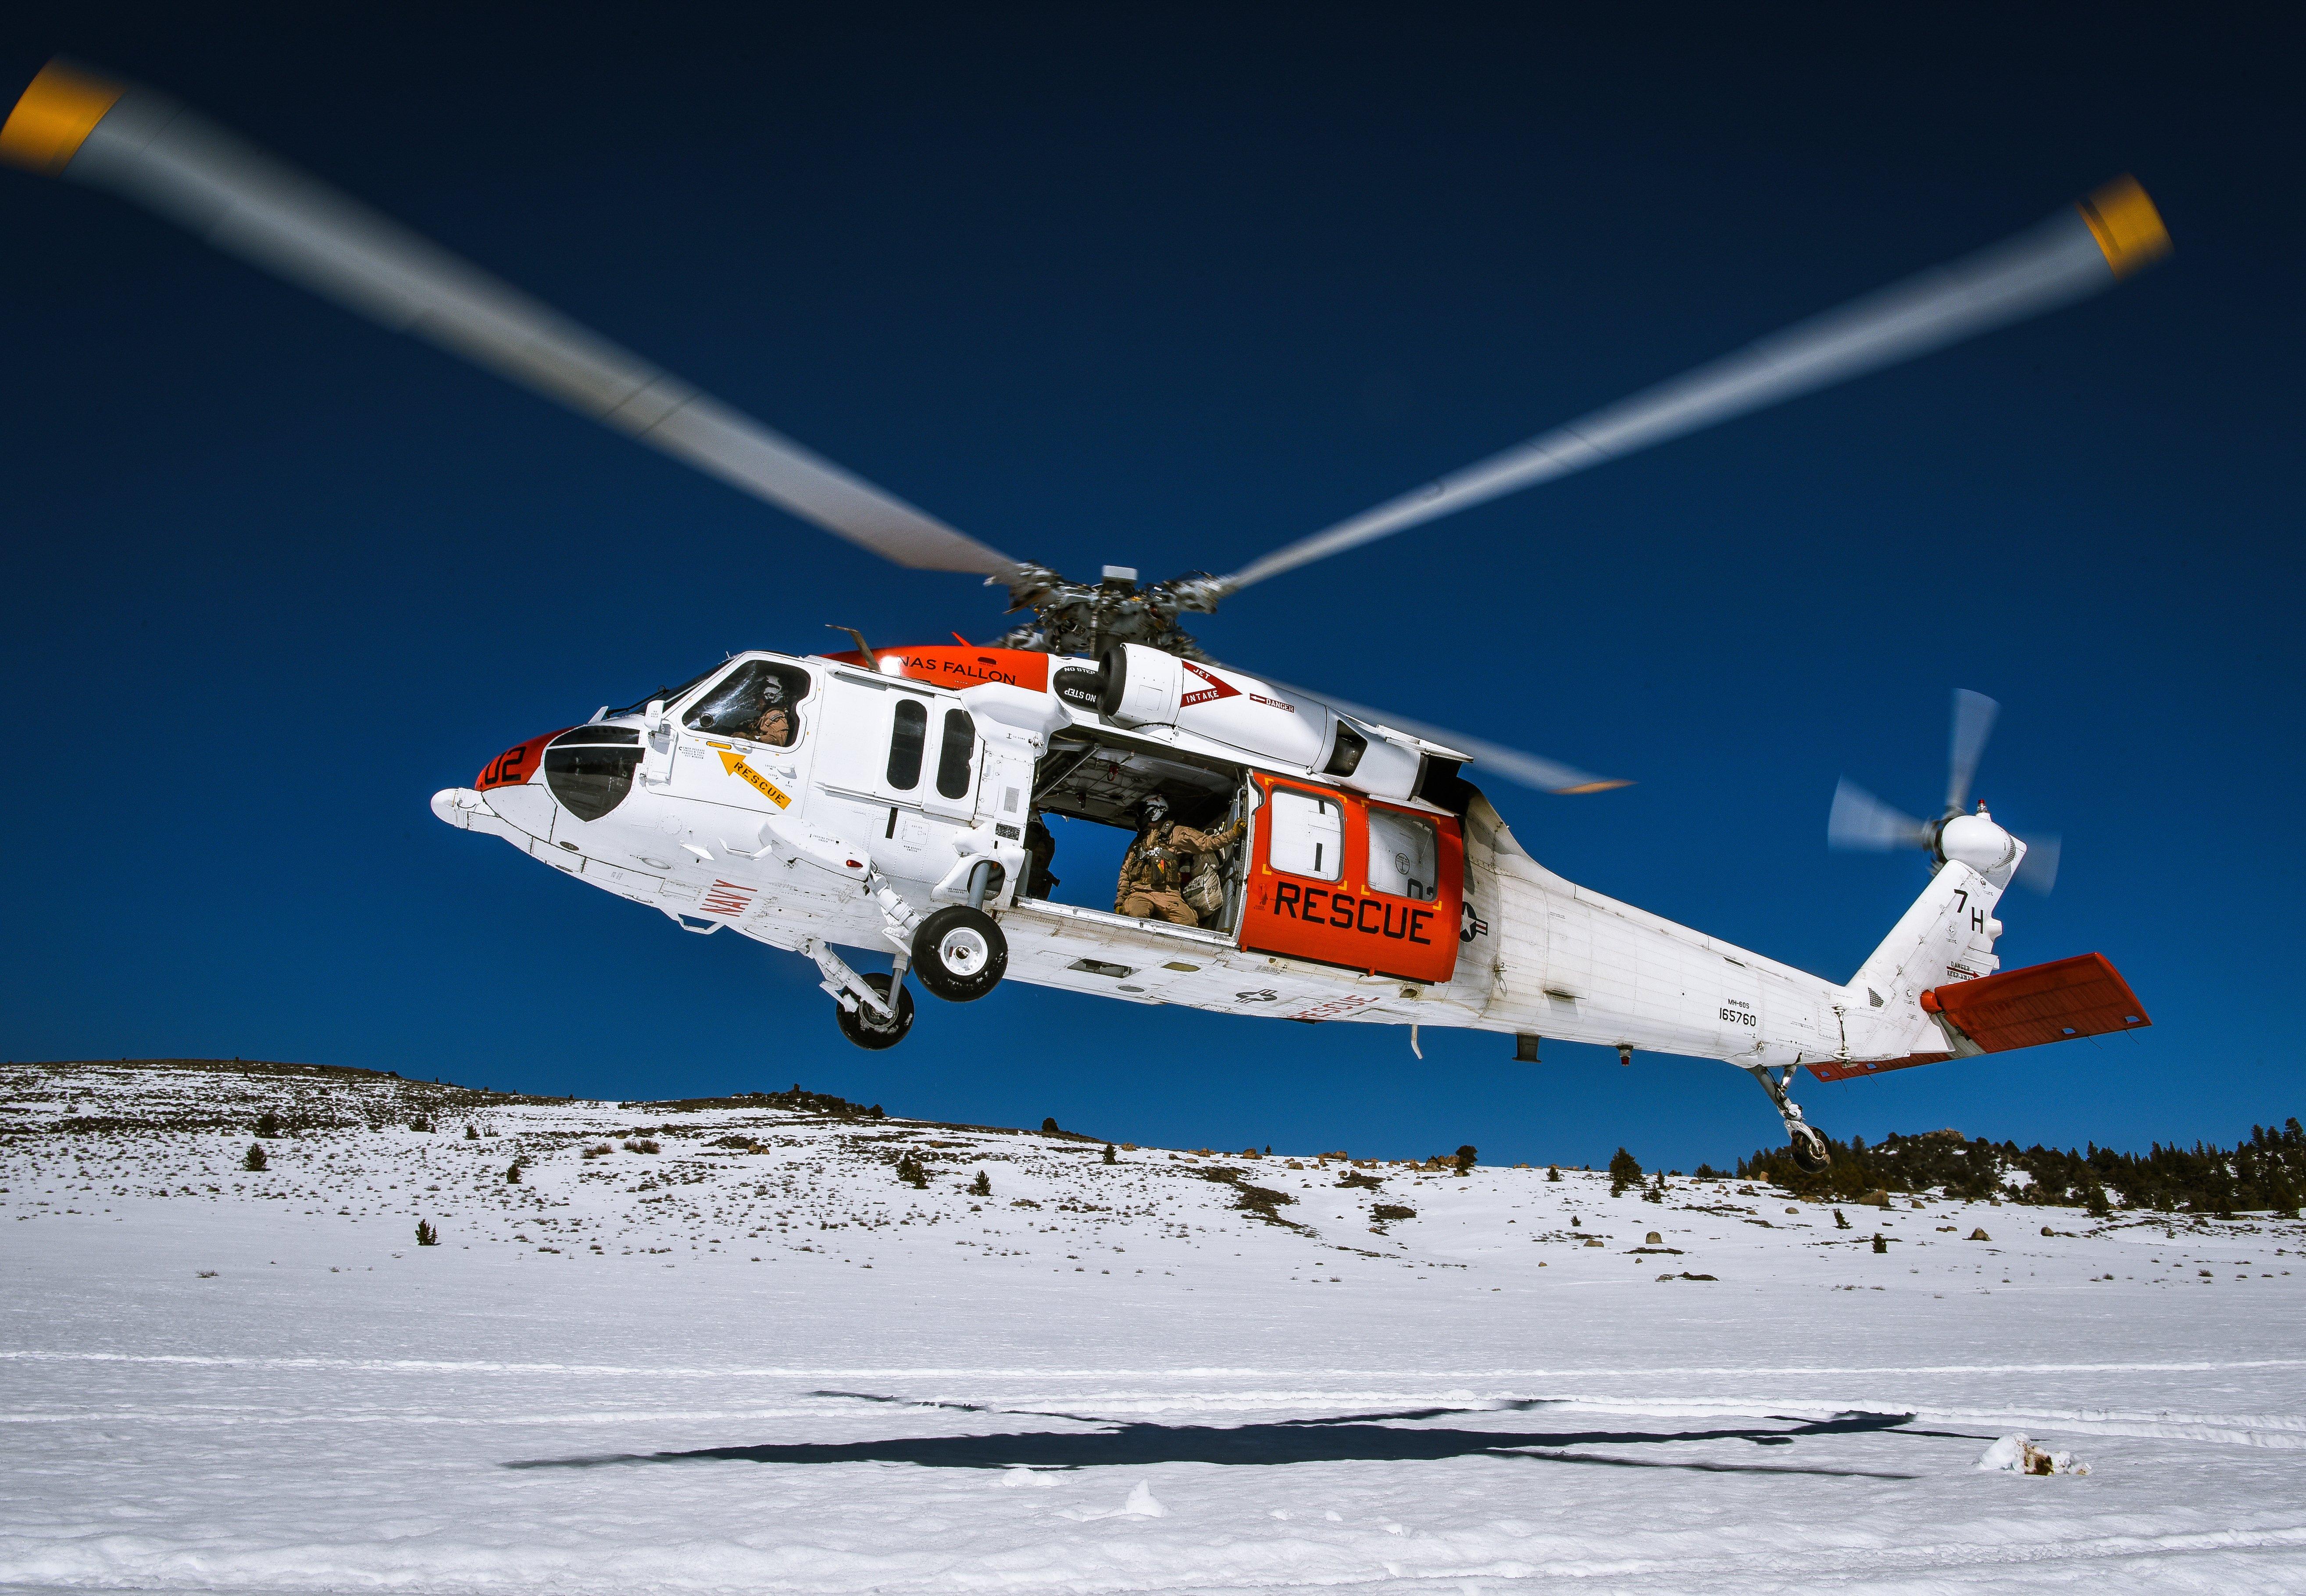 NAS Fallon SAR Team MH-60S in flight [US Navy/Chief Mass Communication Specialist Shannon Renfoe]